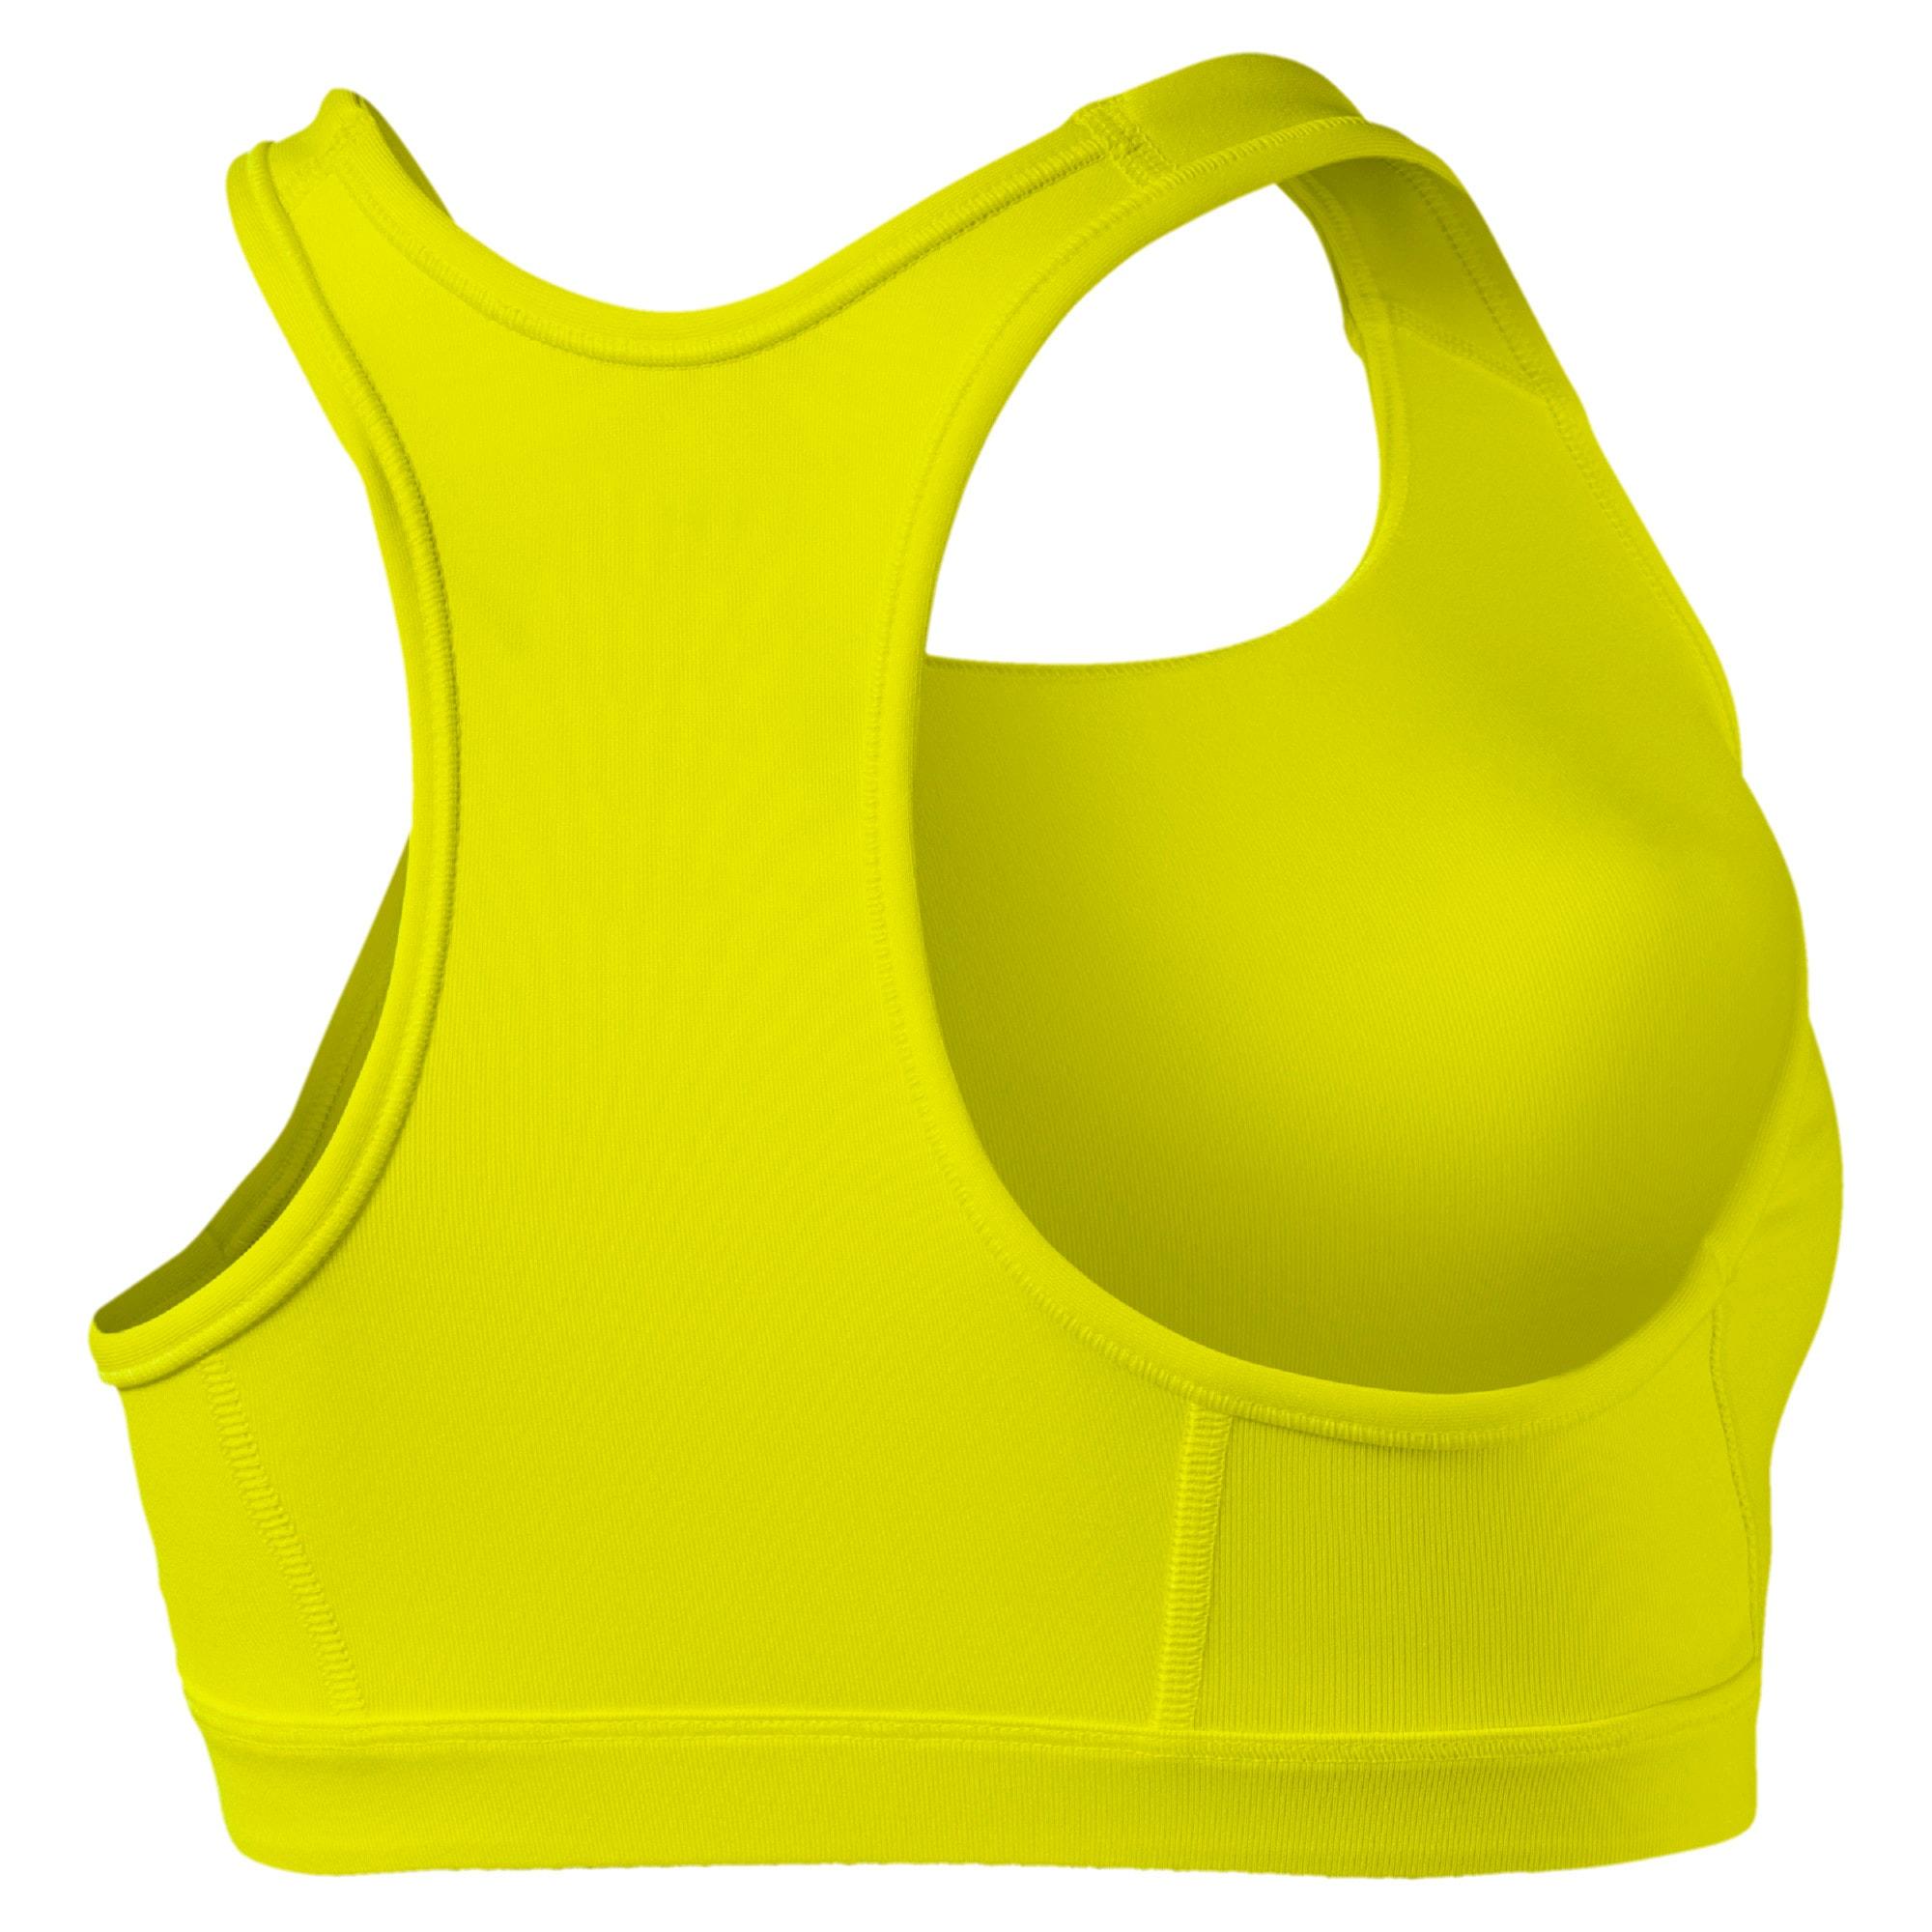 Thumbnail 5 of 4Keeps Women's Mid Impact Bra, Yellow Alert, medium